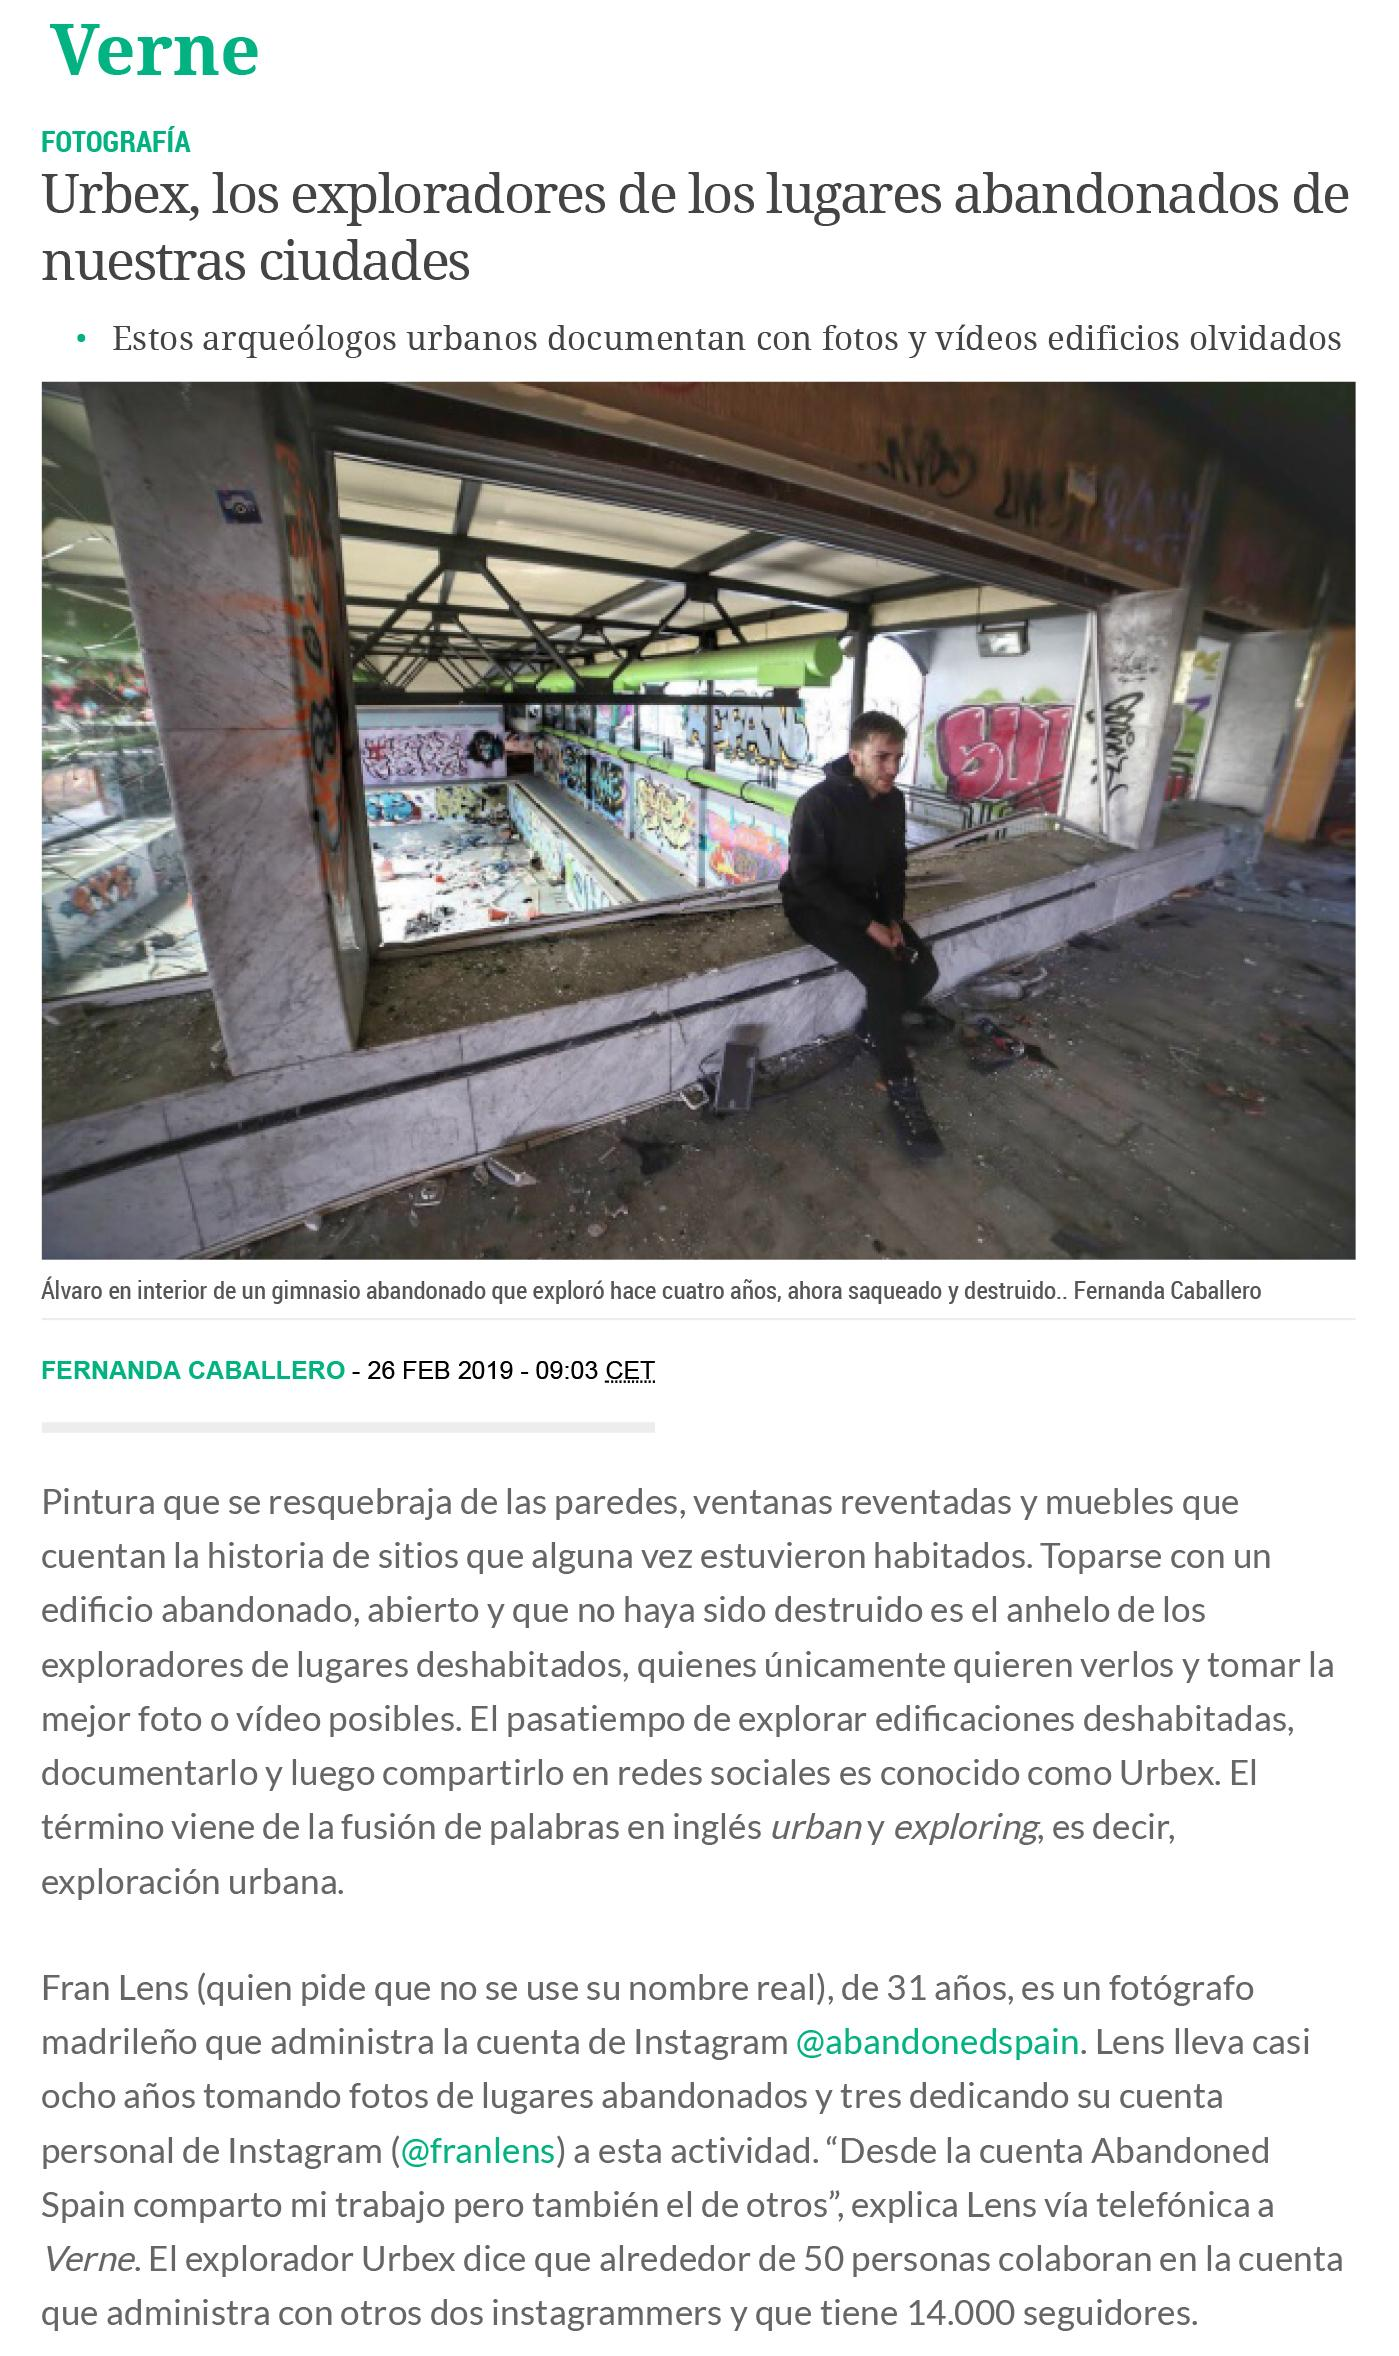 Entrevista de Abandoned Spain para Verne